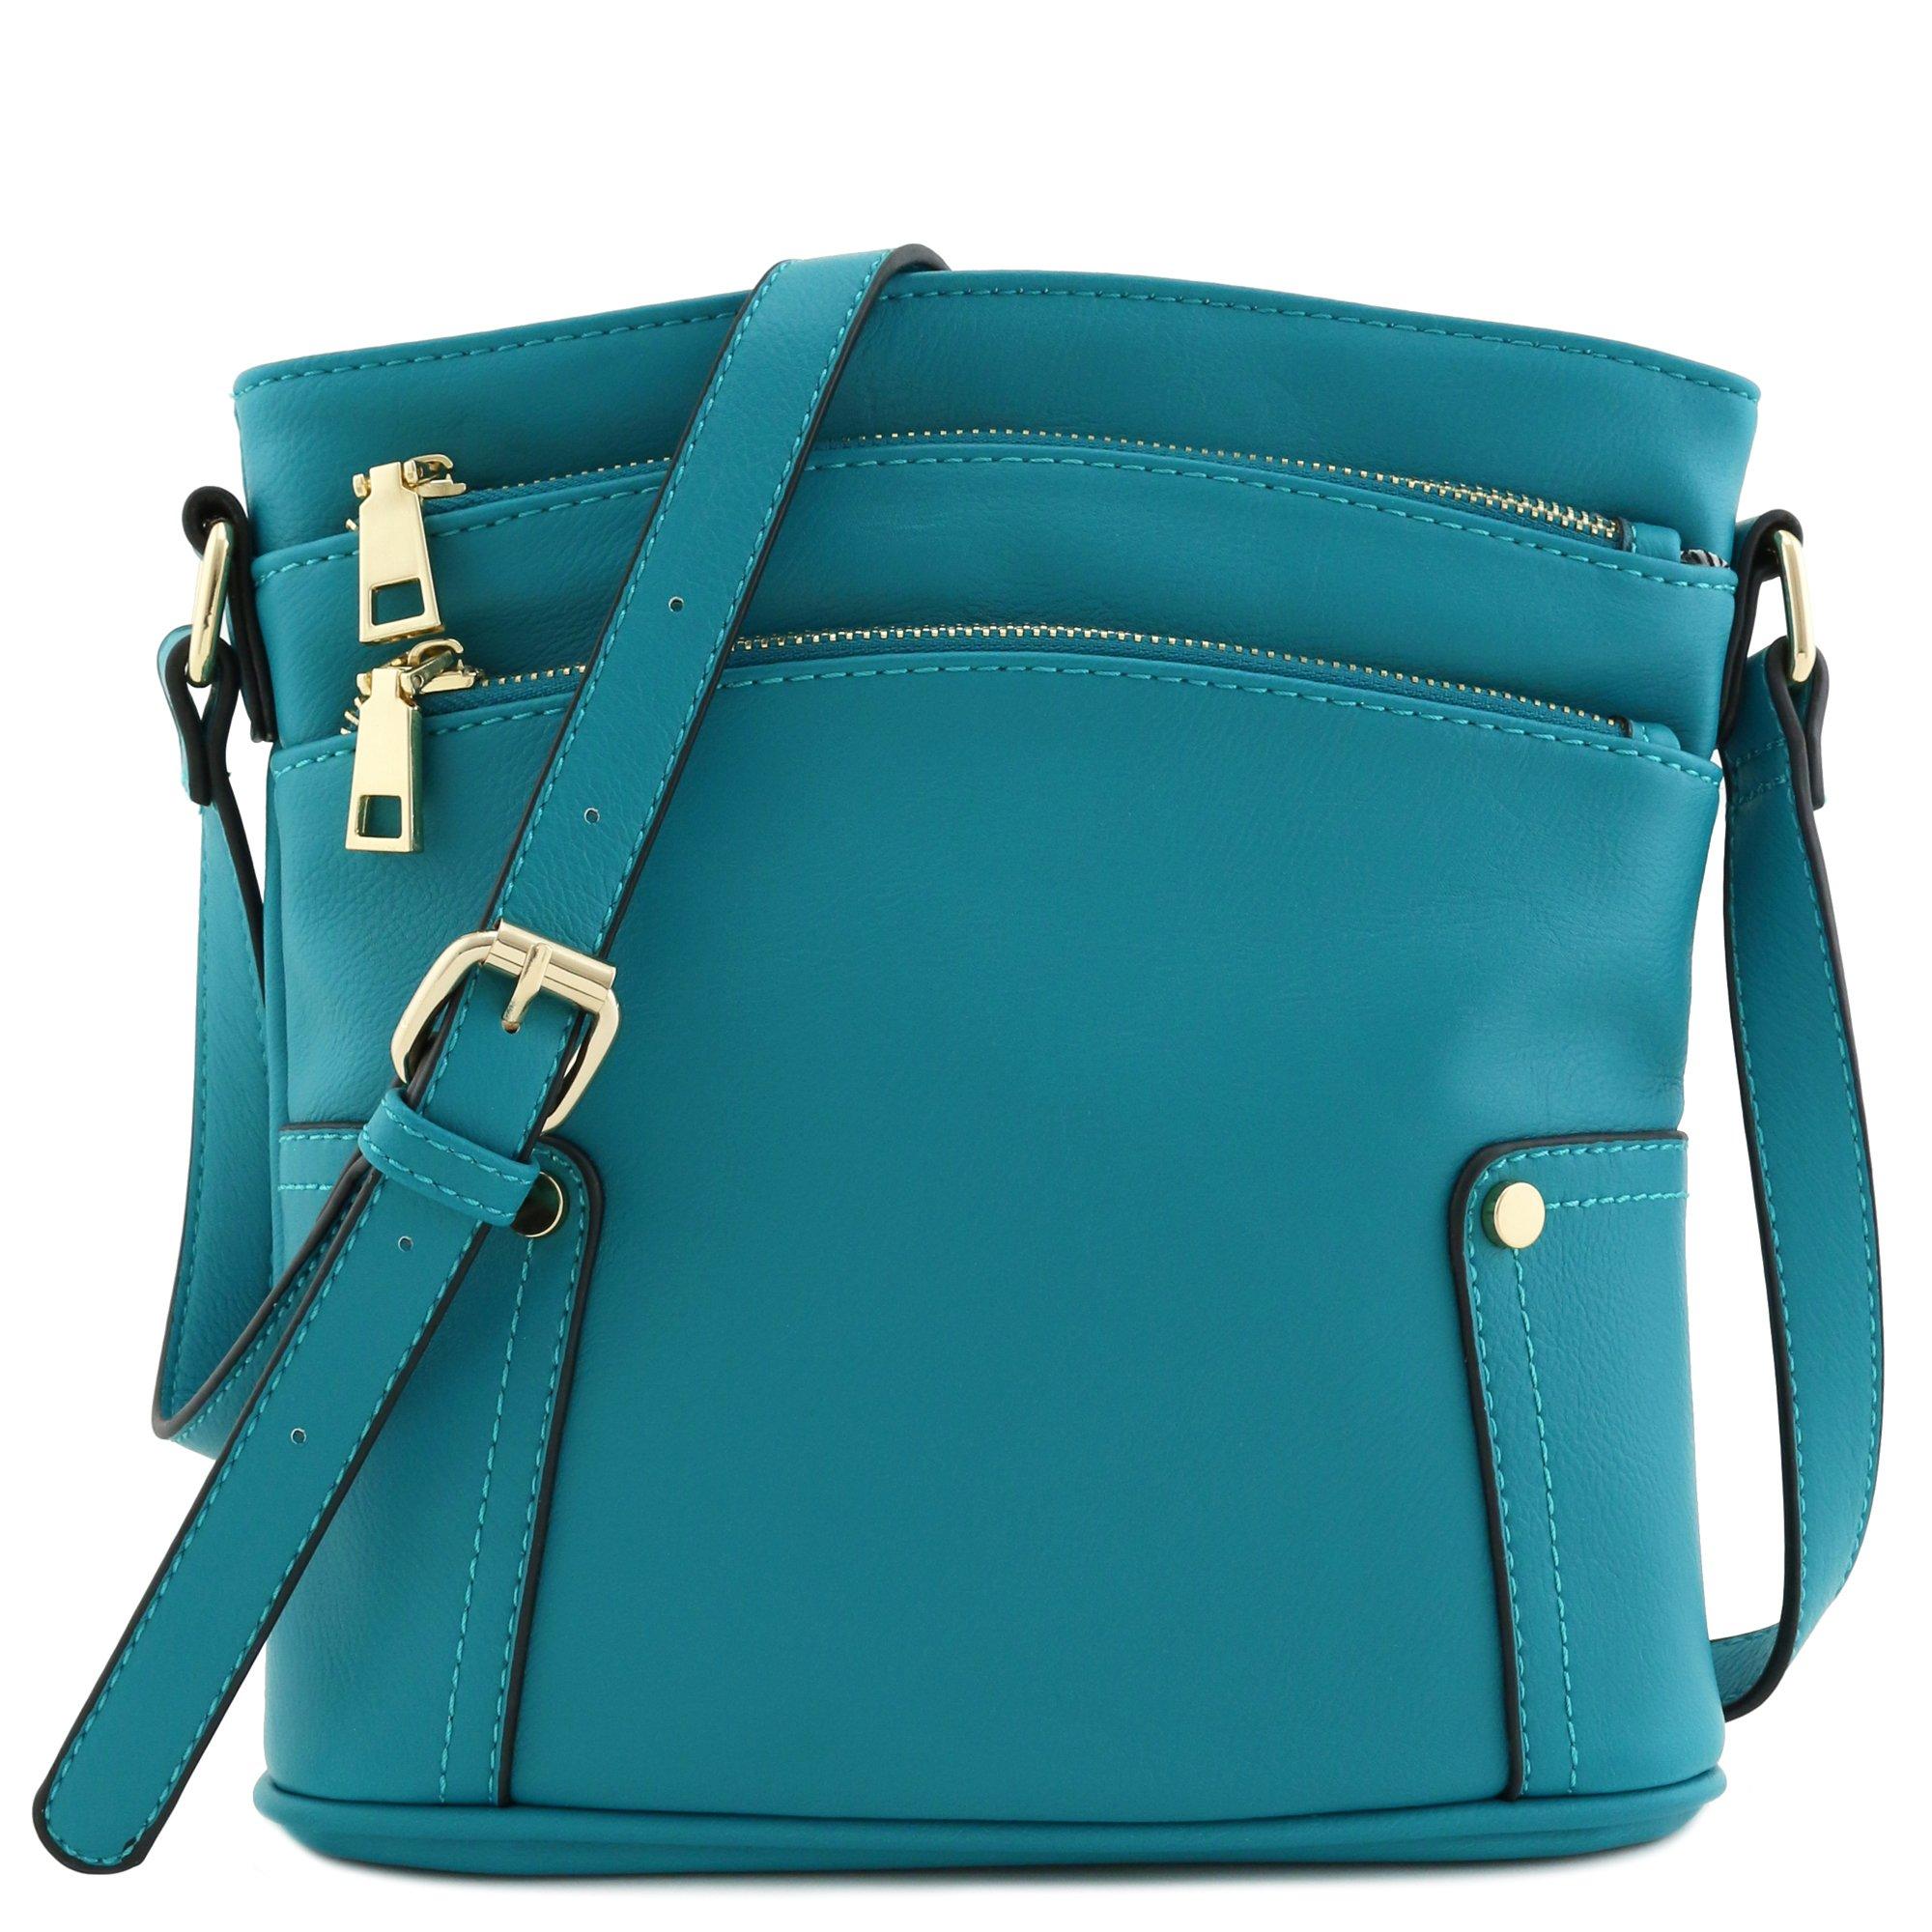 Triple Zip Pocket Medium Crossbody Bag (Teal)